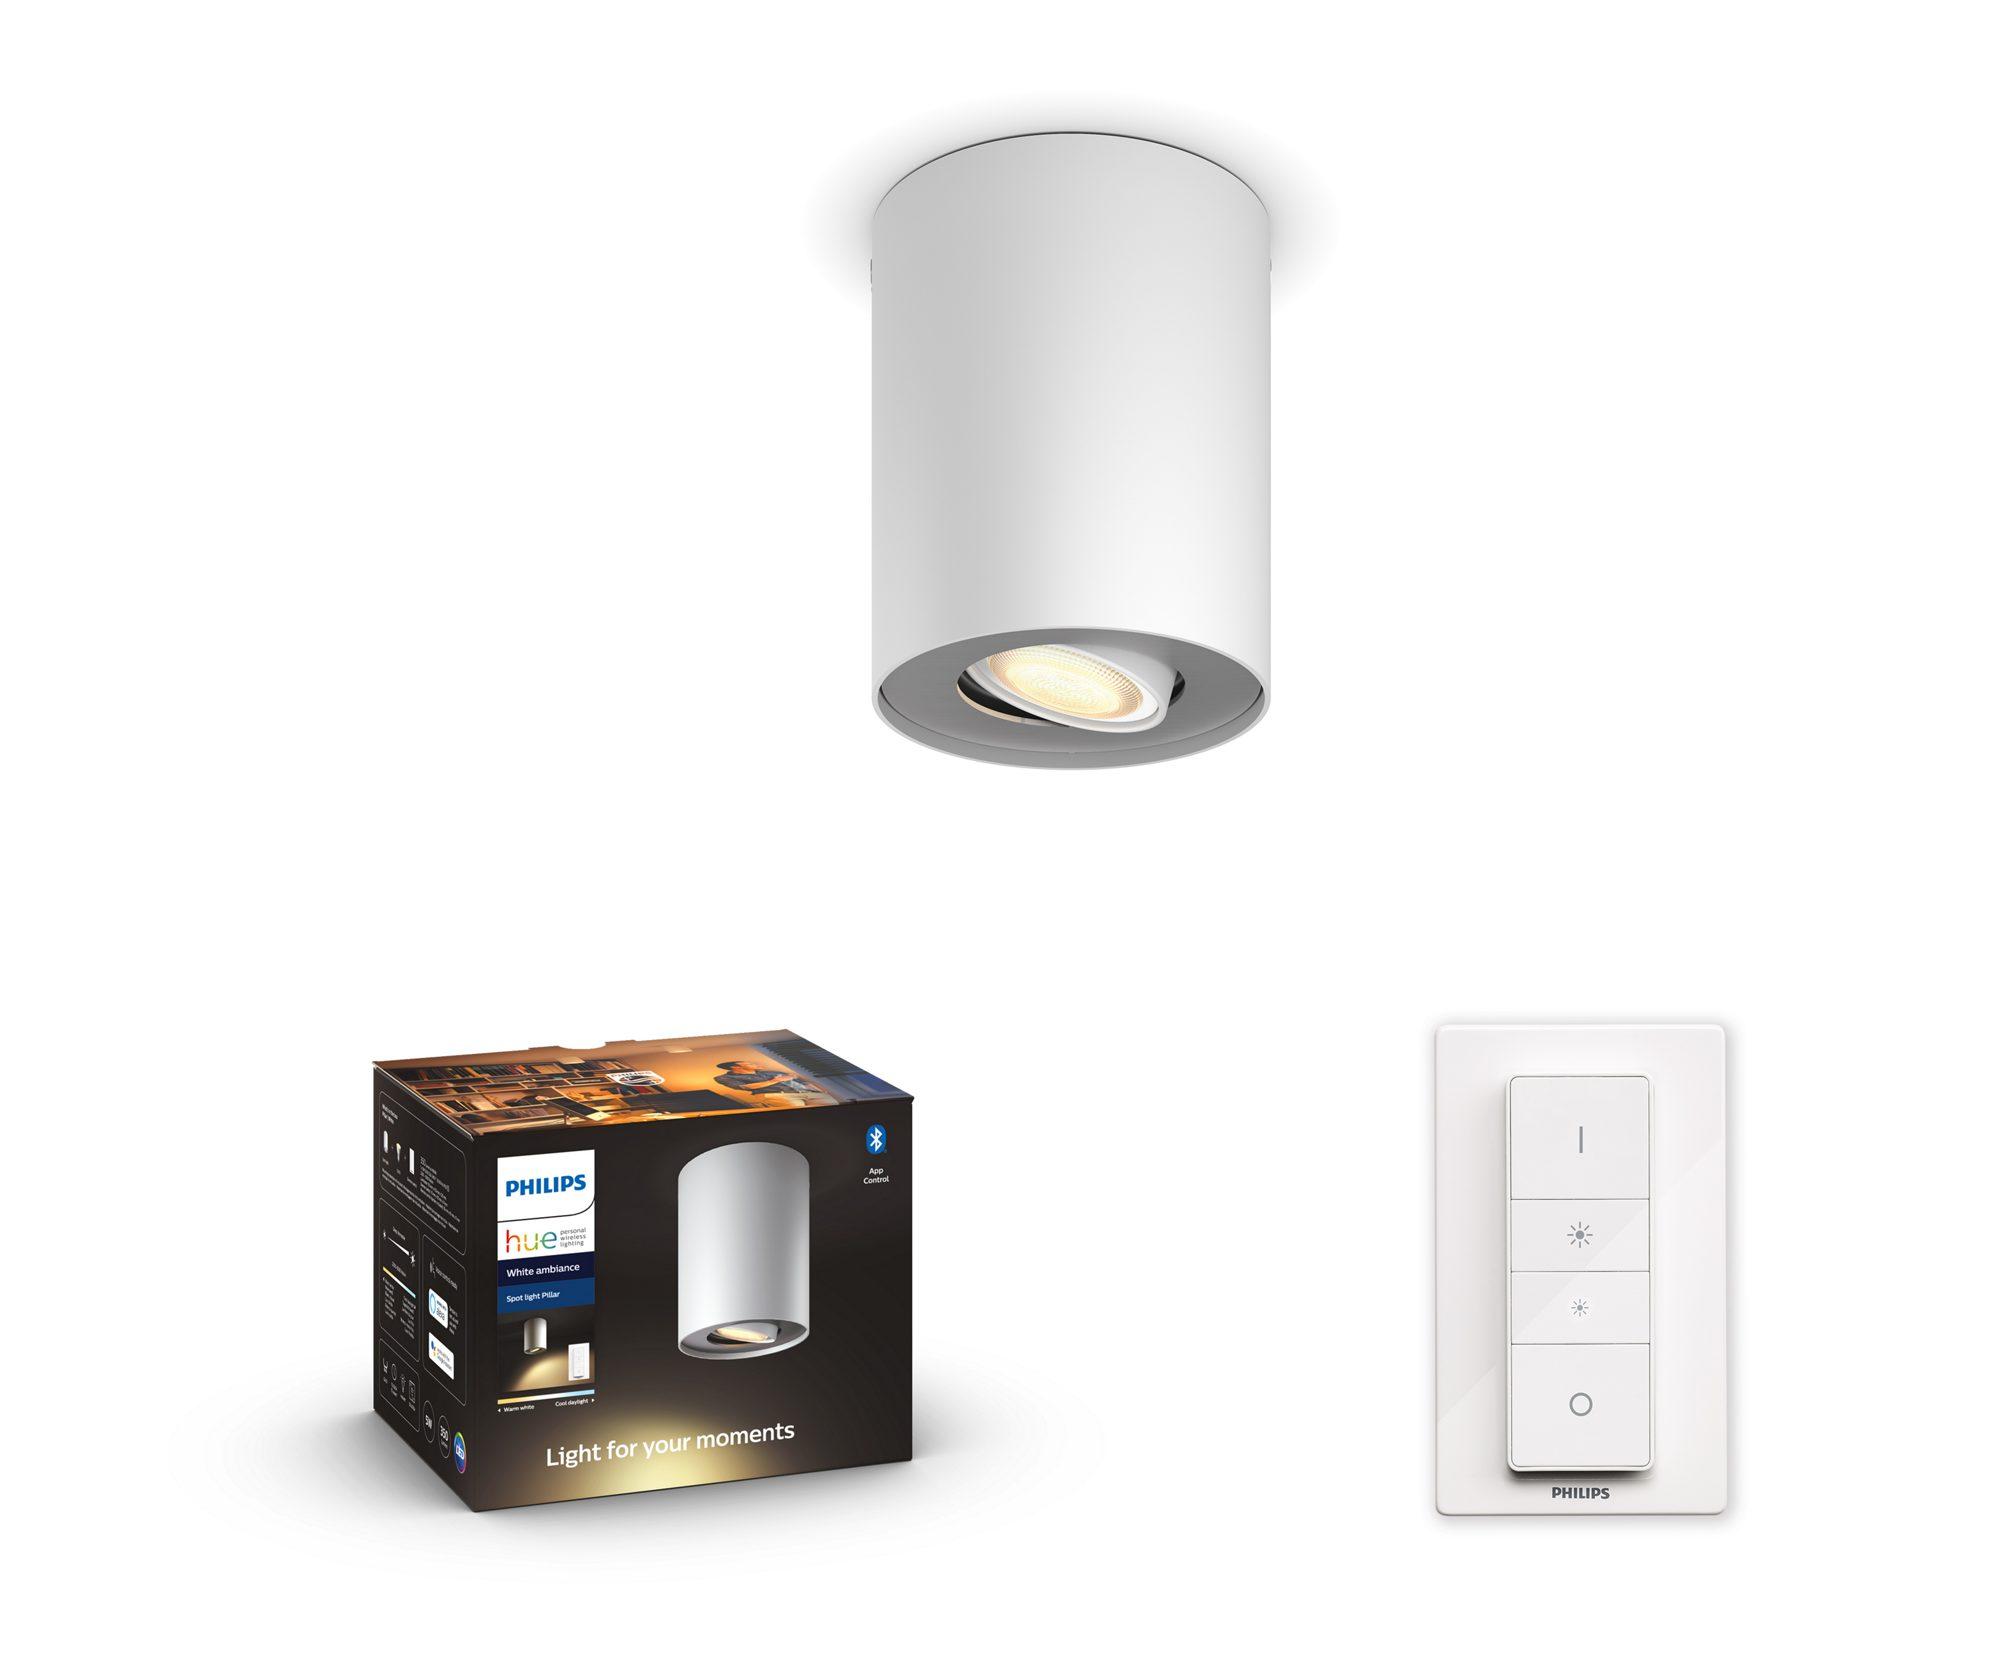 Philips Hue - Pillar Hue ext. spot single spot white 1 - White Ambiance Bluetooth